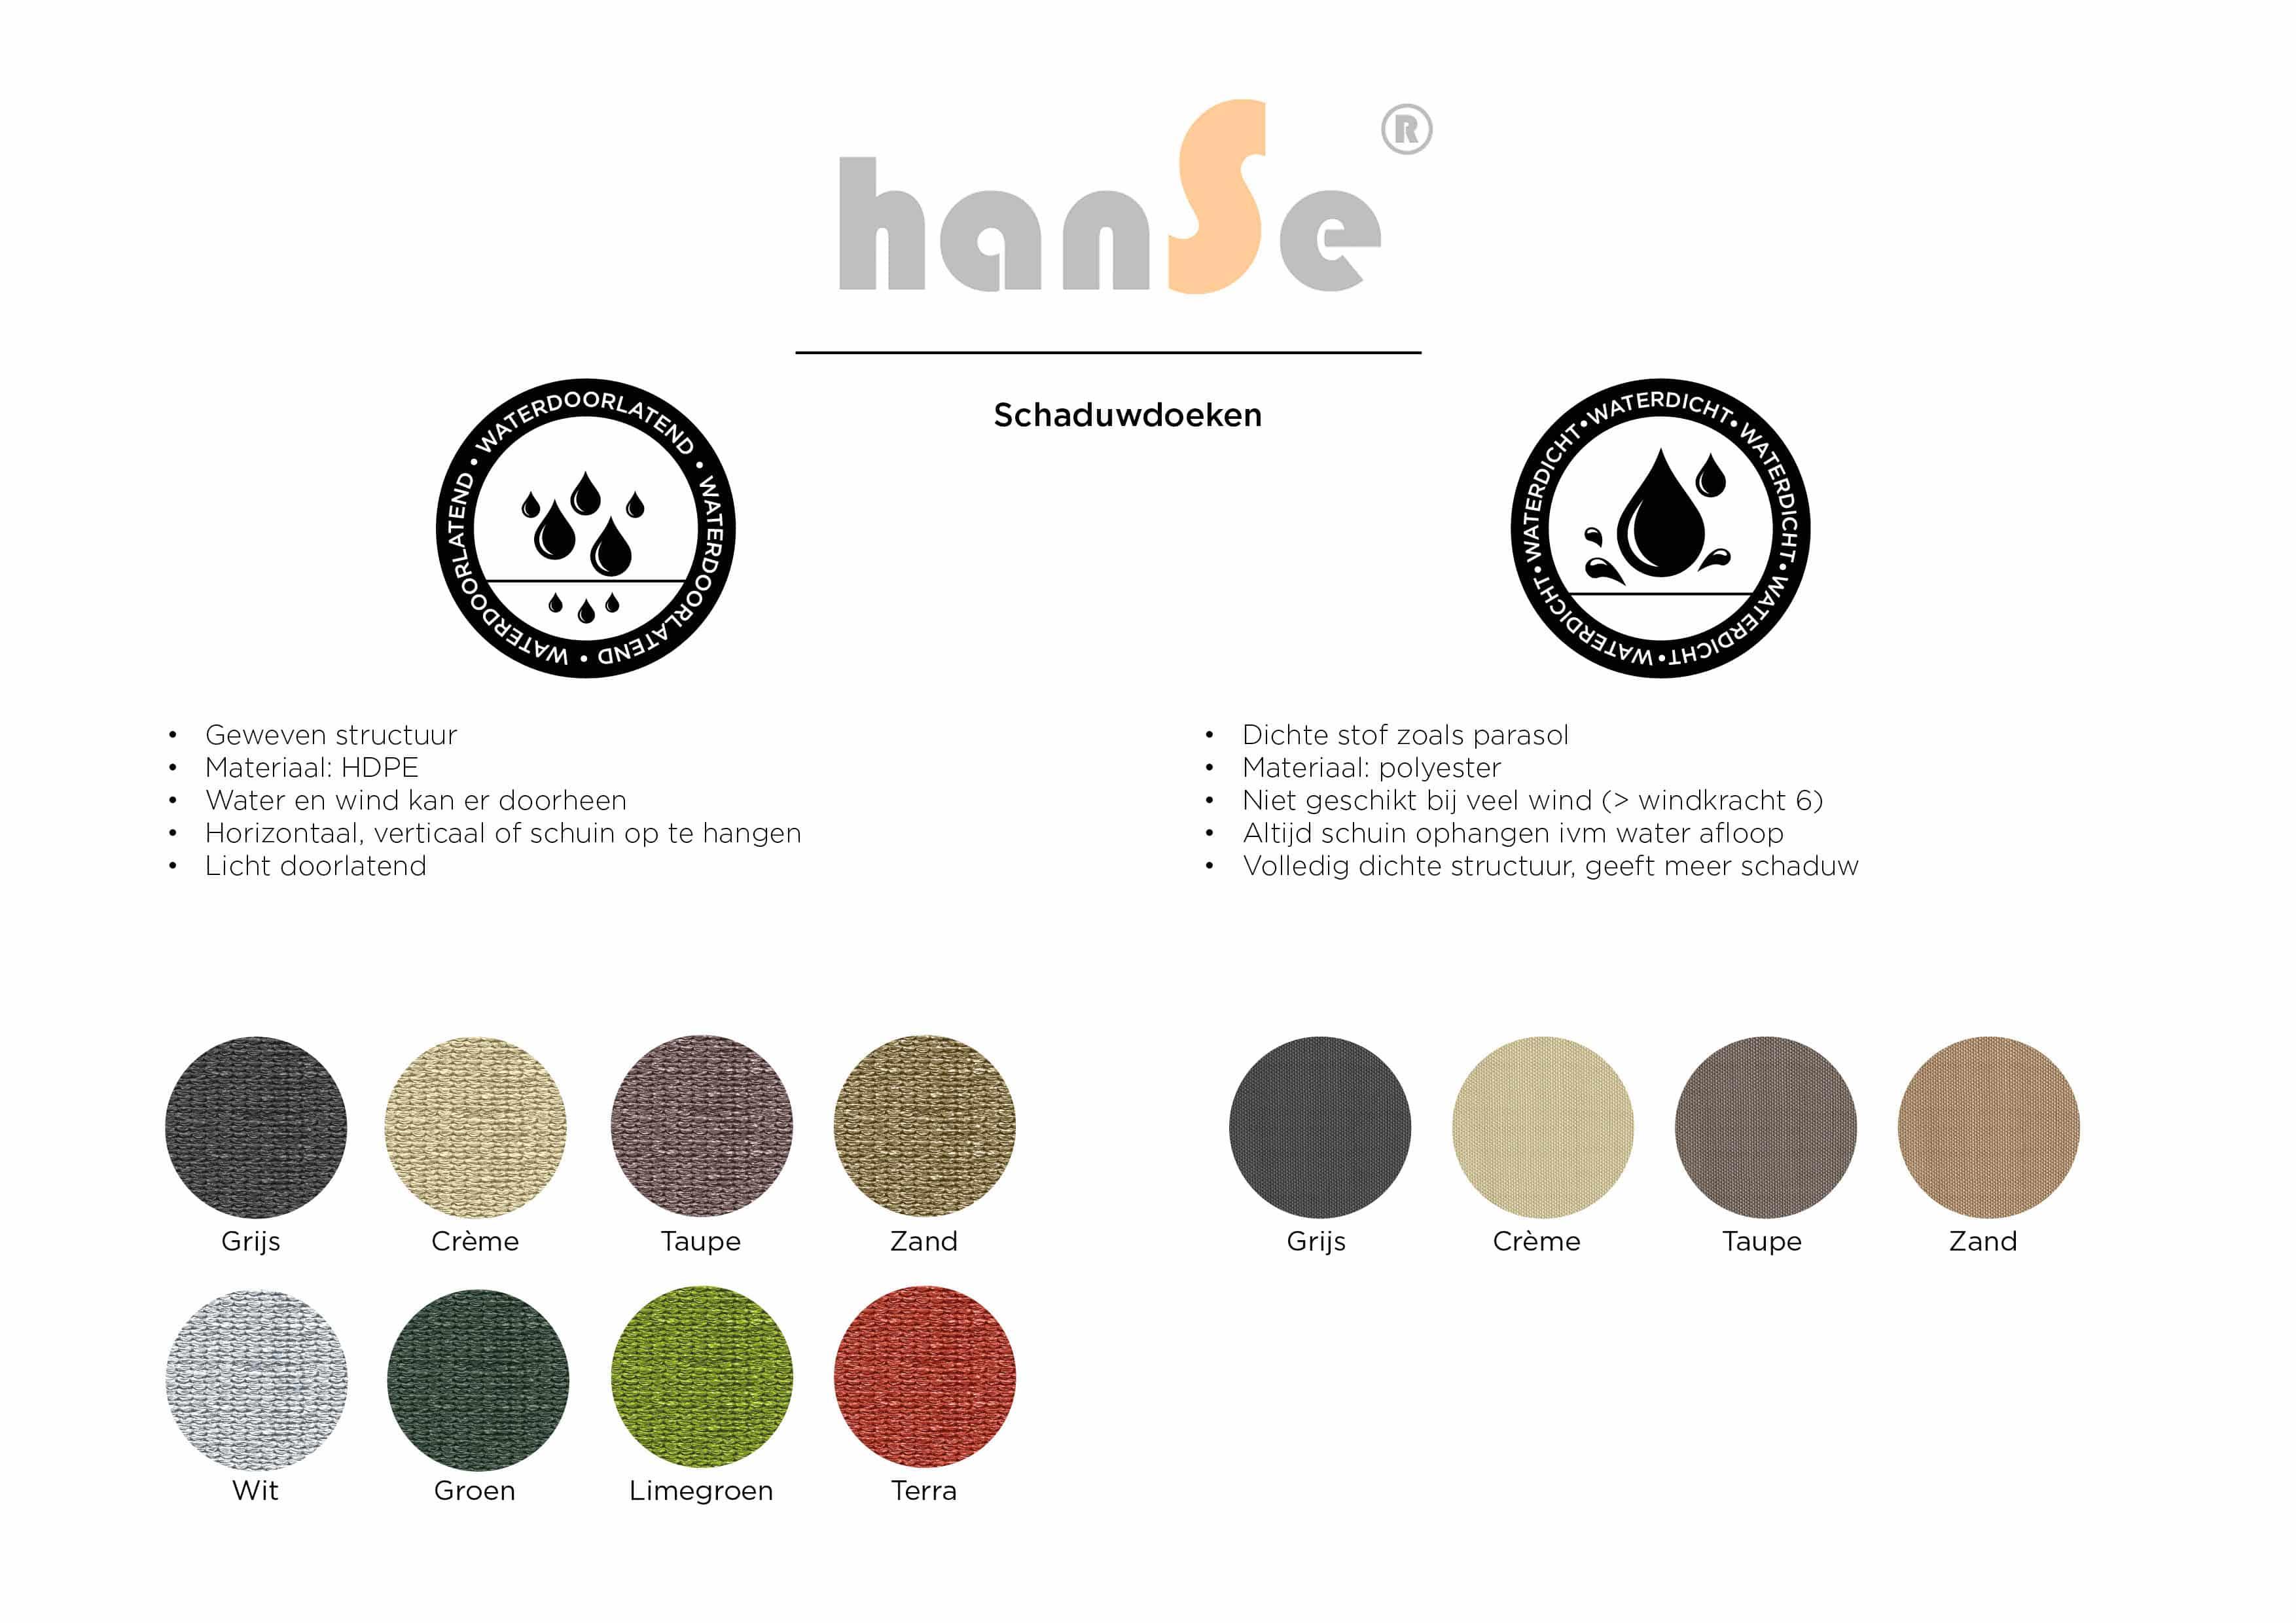 hanSe® Schaduwdoek Vierkant Waterdicht 2x2 m - zonnedoek - Taupe